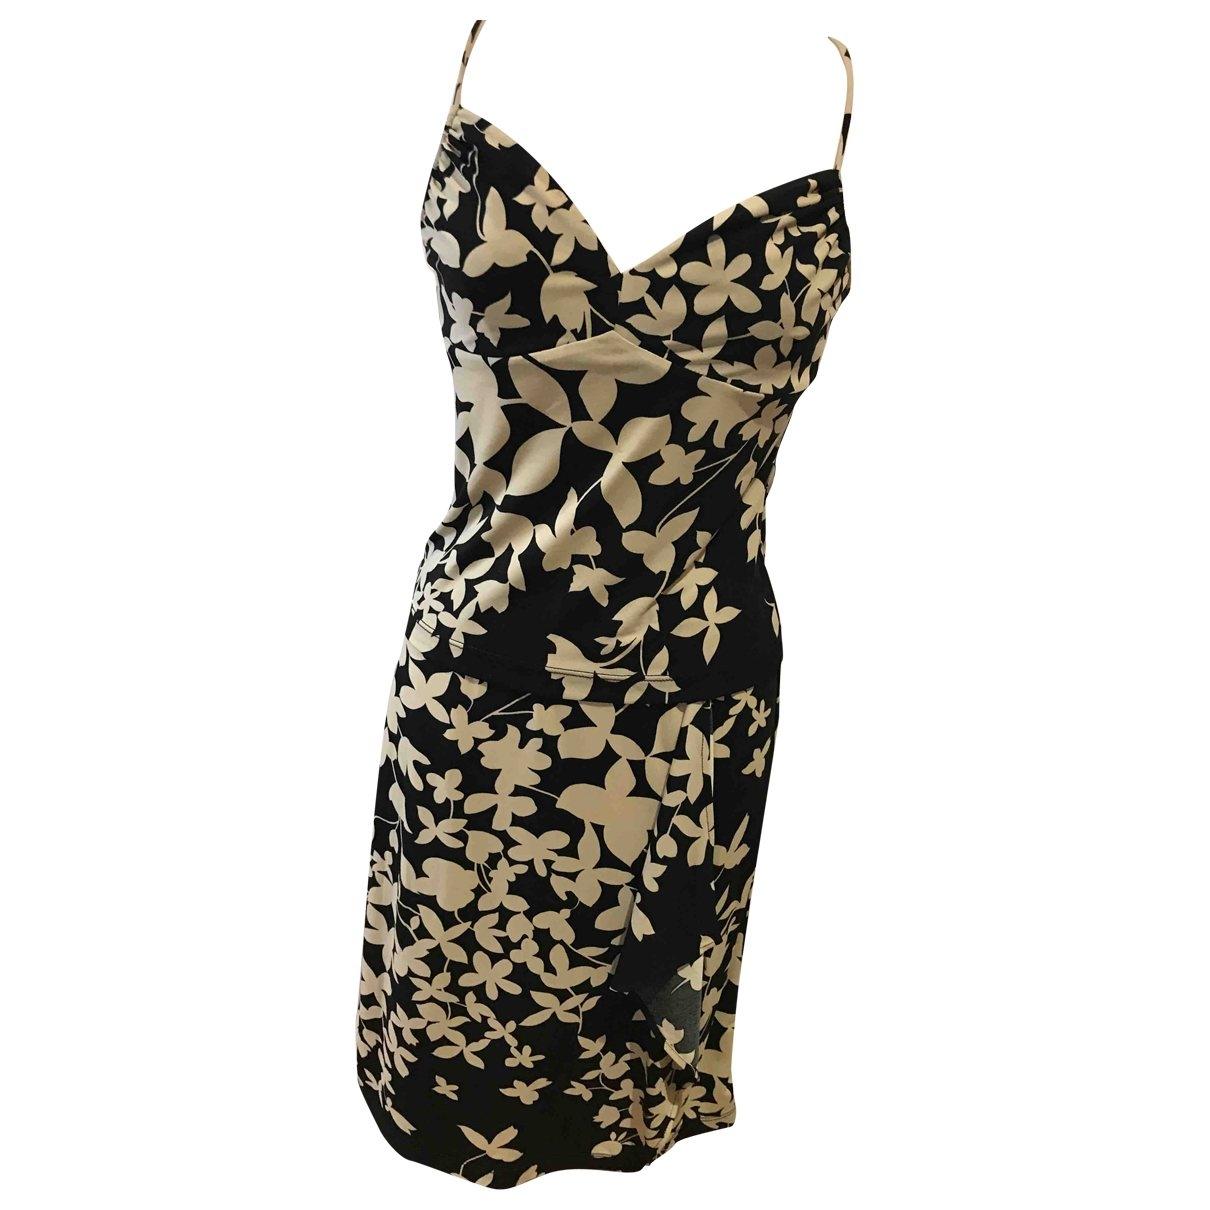 Bcbg Max Azria \N Beige dress for Women 40 FR